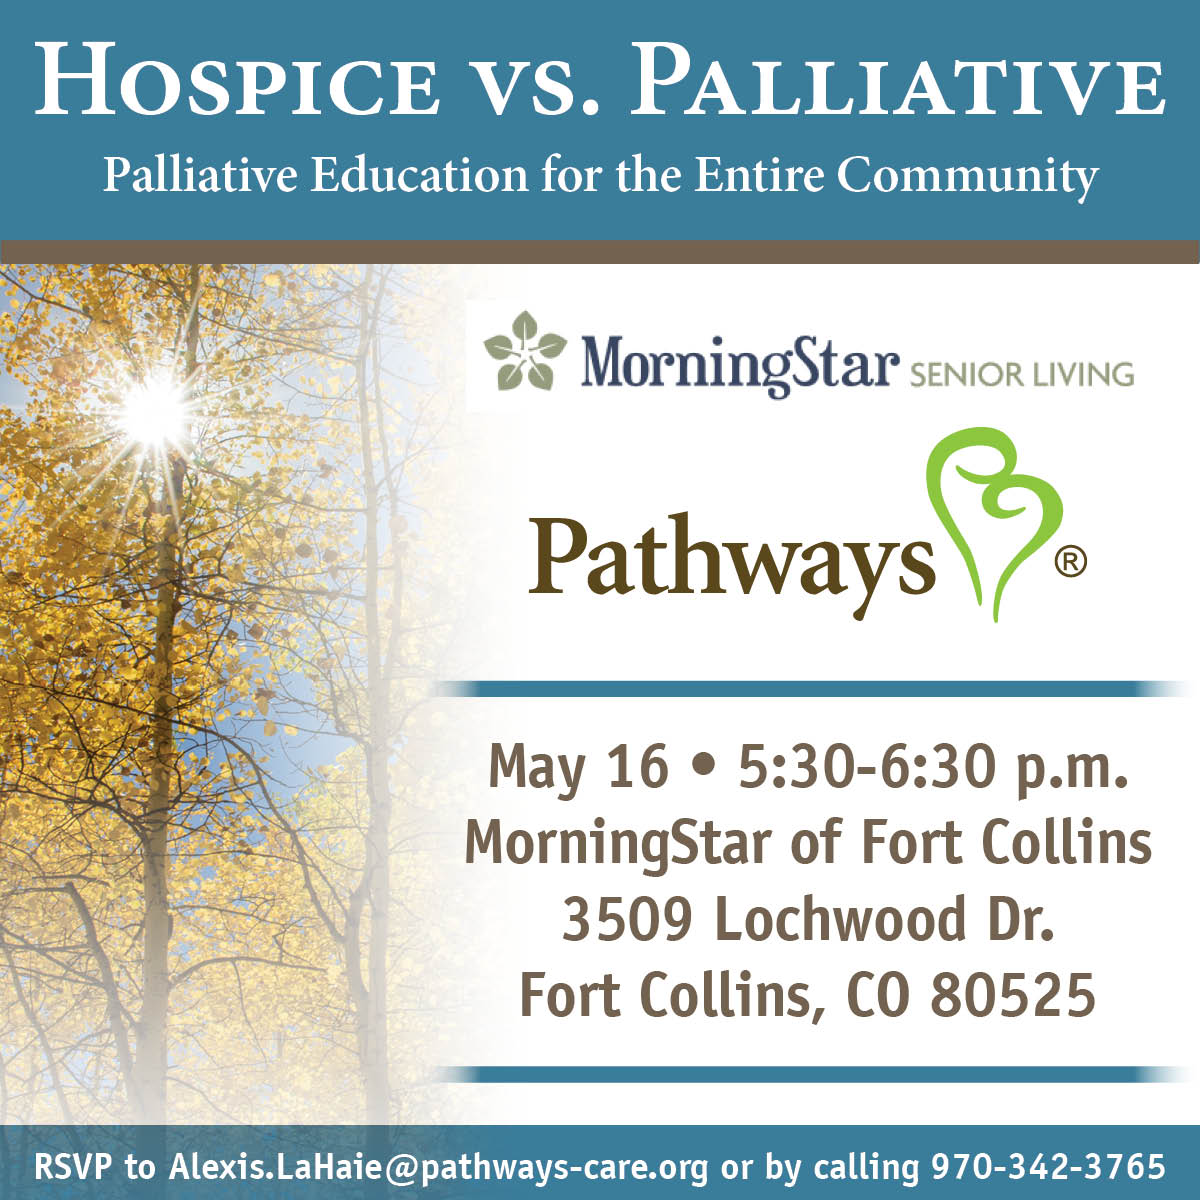 hospice vs palliative